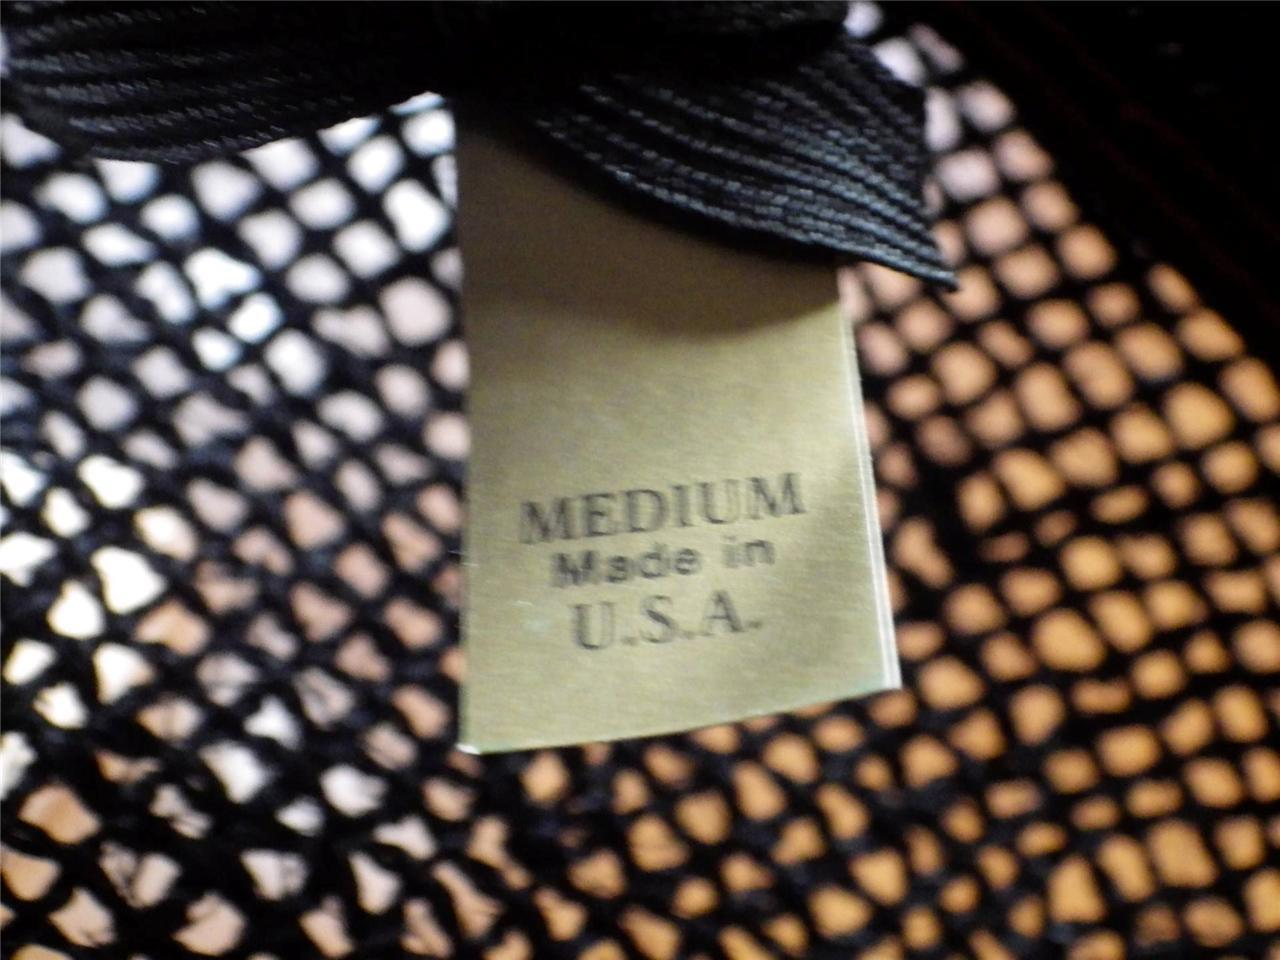 Vintage Cabbie Newsboy Hat Woven Straw - Black Unisex Made in USA